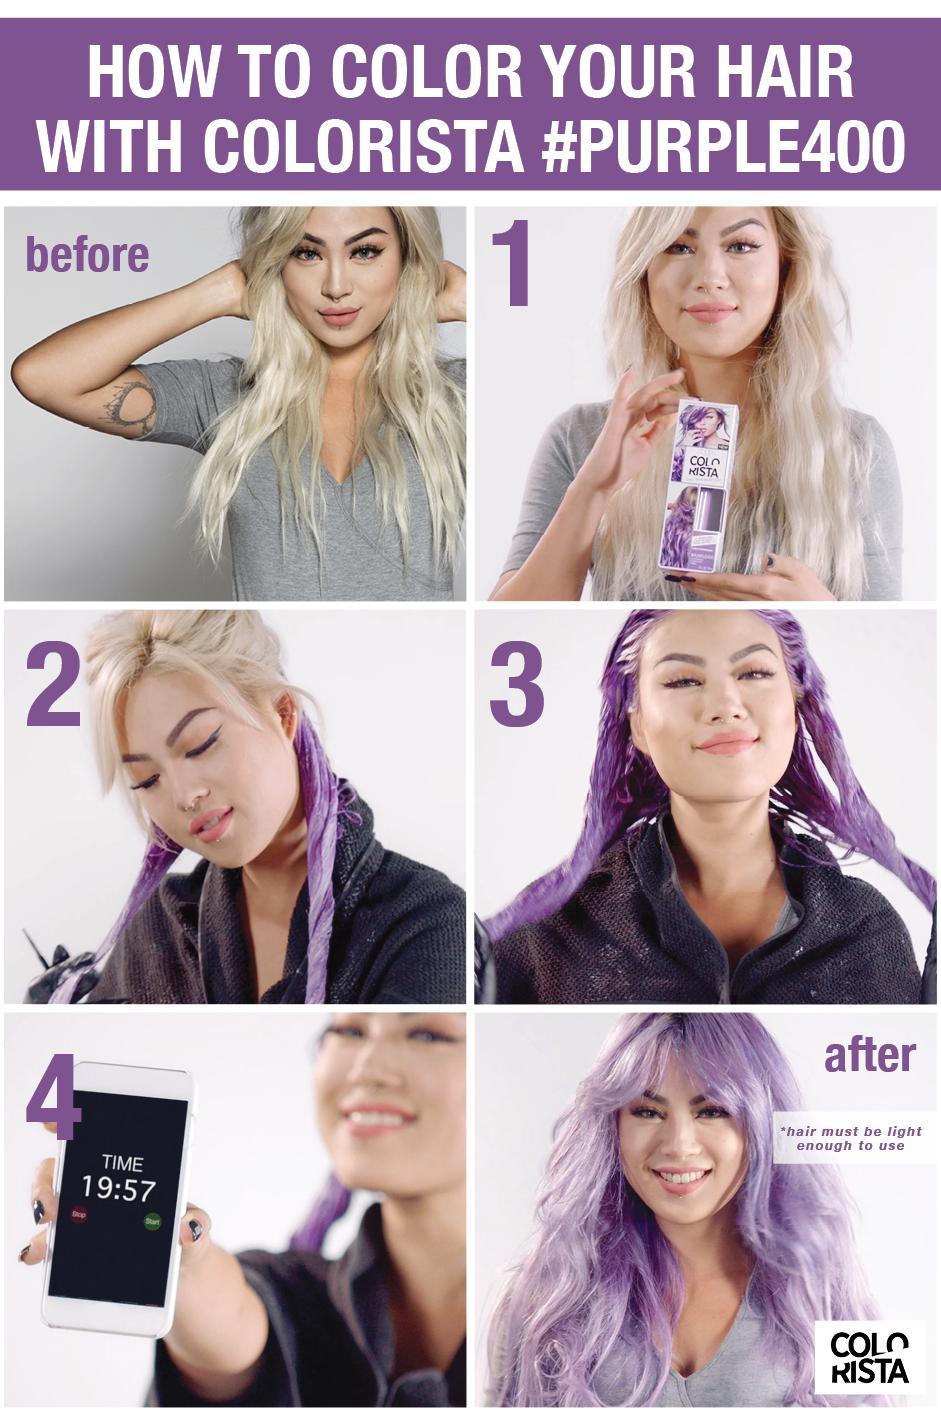 Colorista Semi Permanent Hair Color For Light Blonde Hair Permanent Hair Color Semi Permanent Hair Color Blonde Hair Color